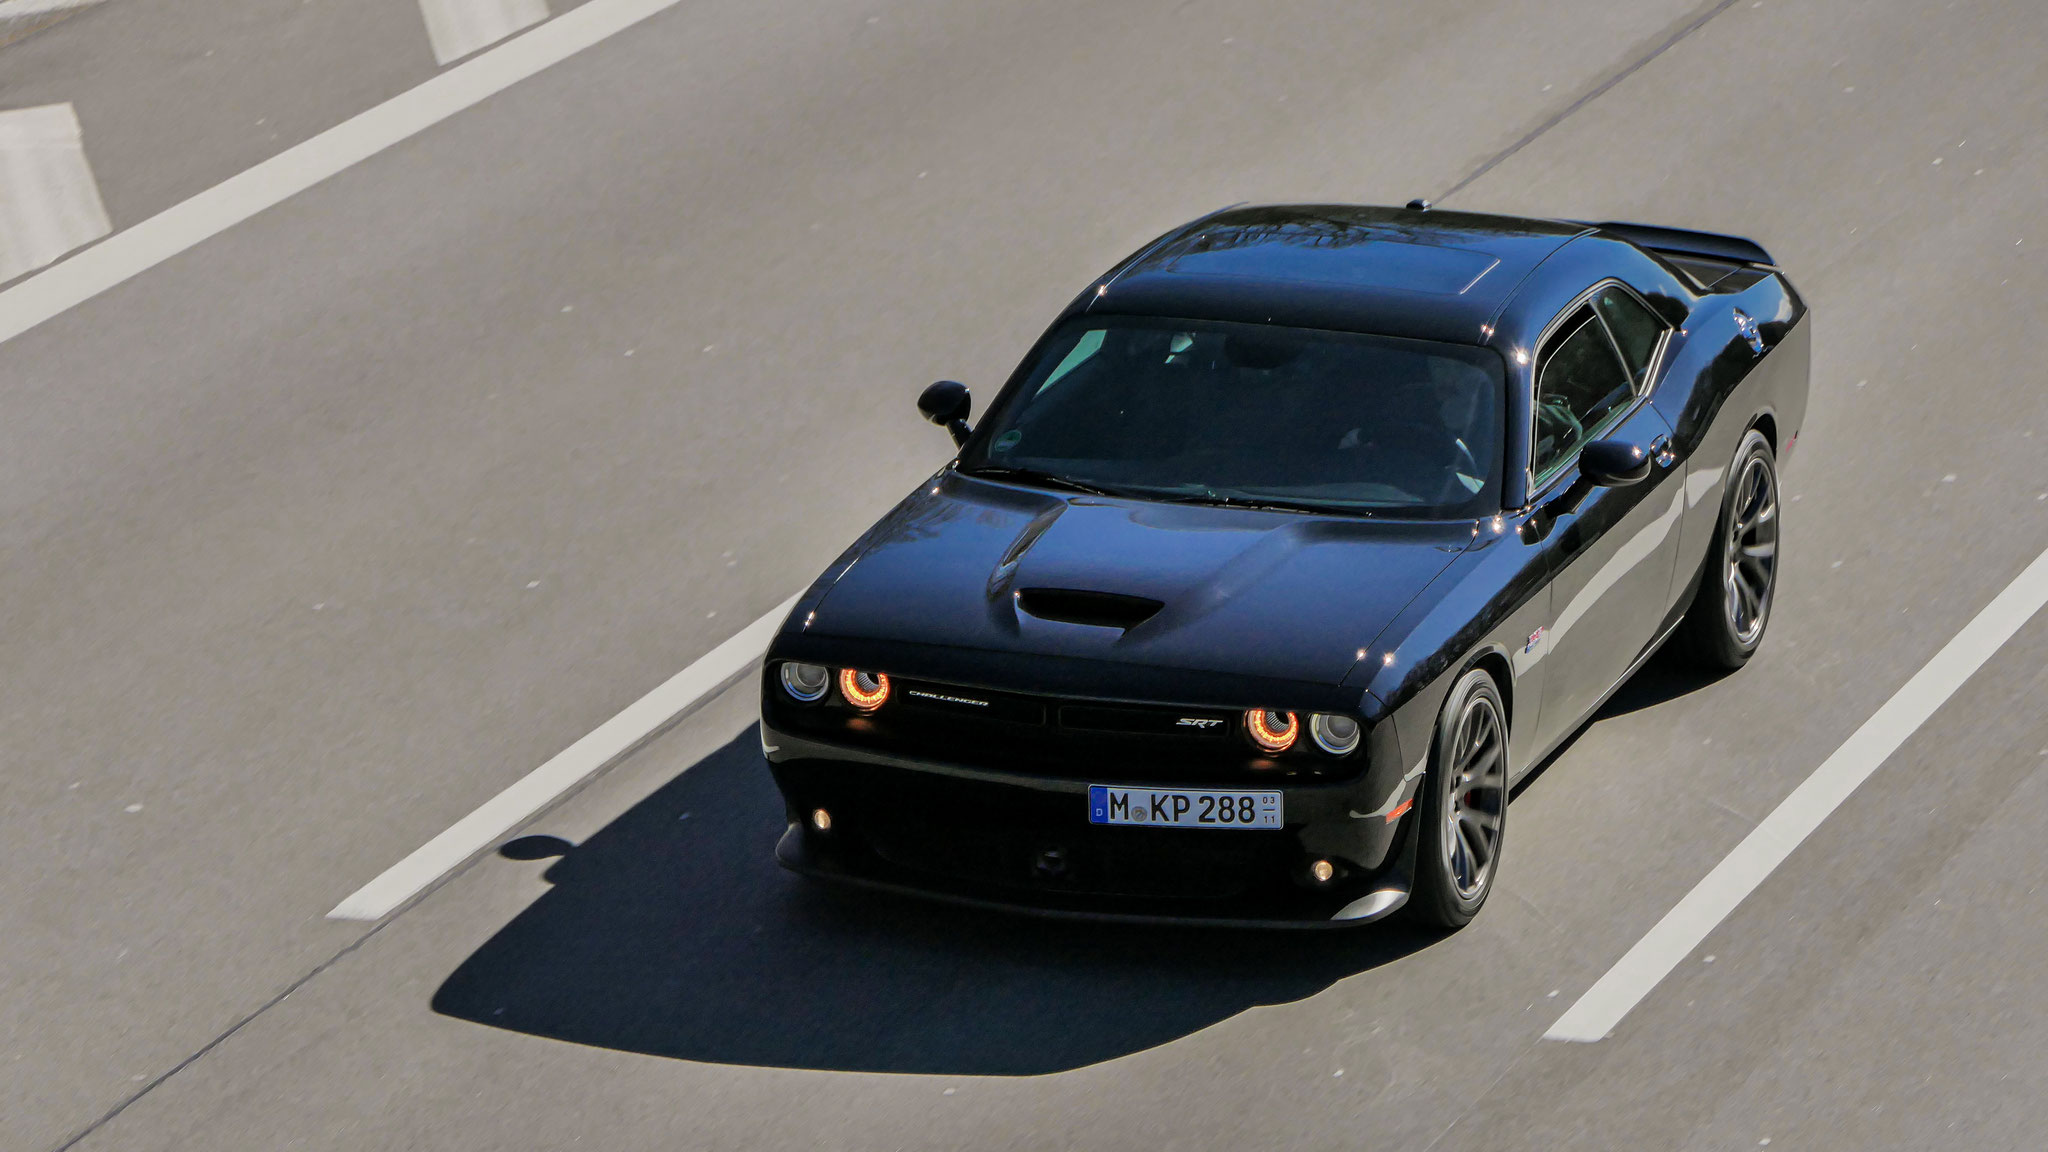 Dodge Challenger SRT - M-KP-288